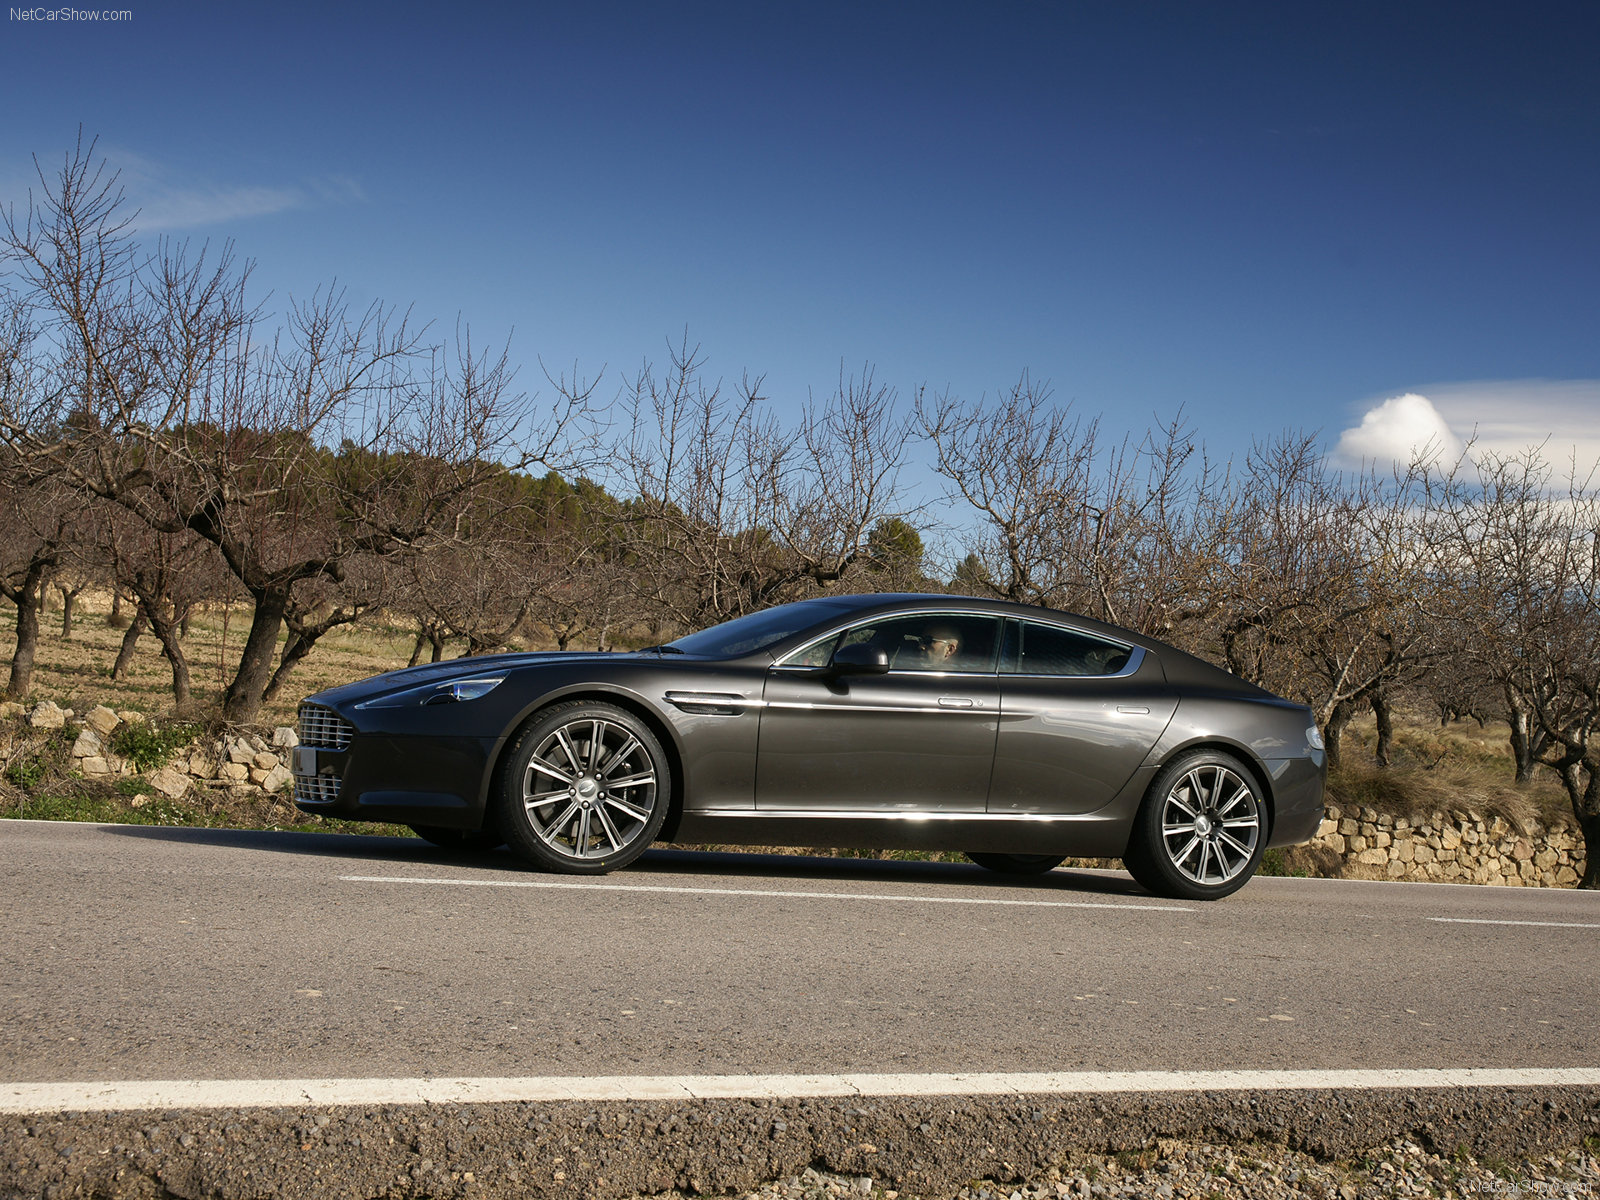 HV Supercars Aston Martin Rapide Specs Prices - Aston martin 4 door price